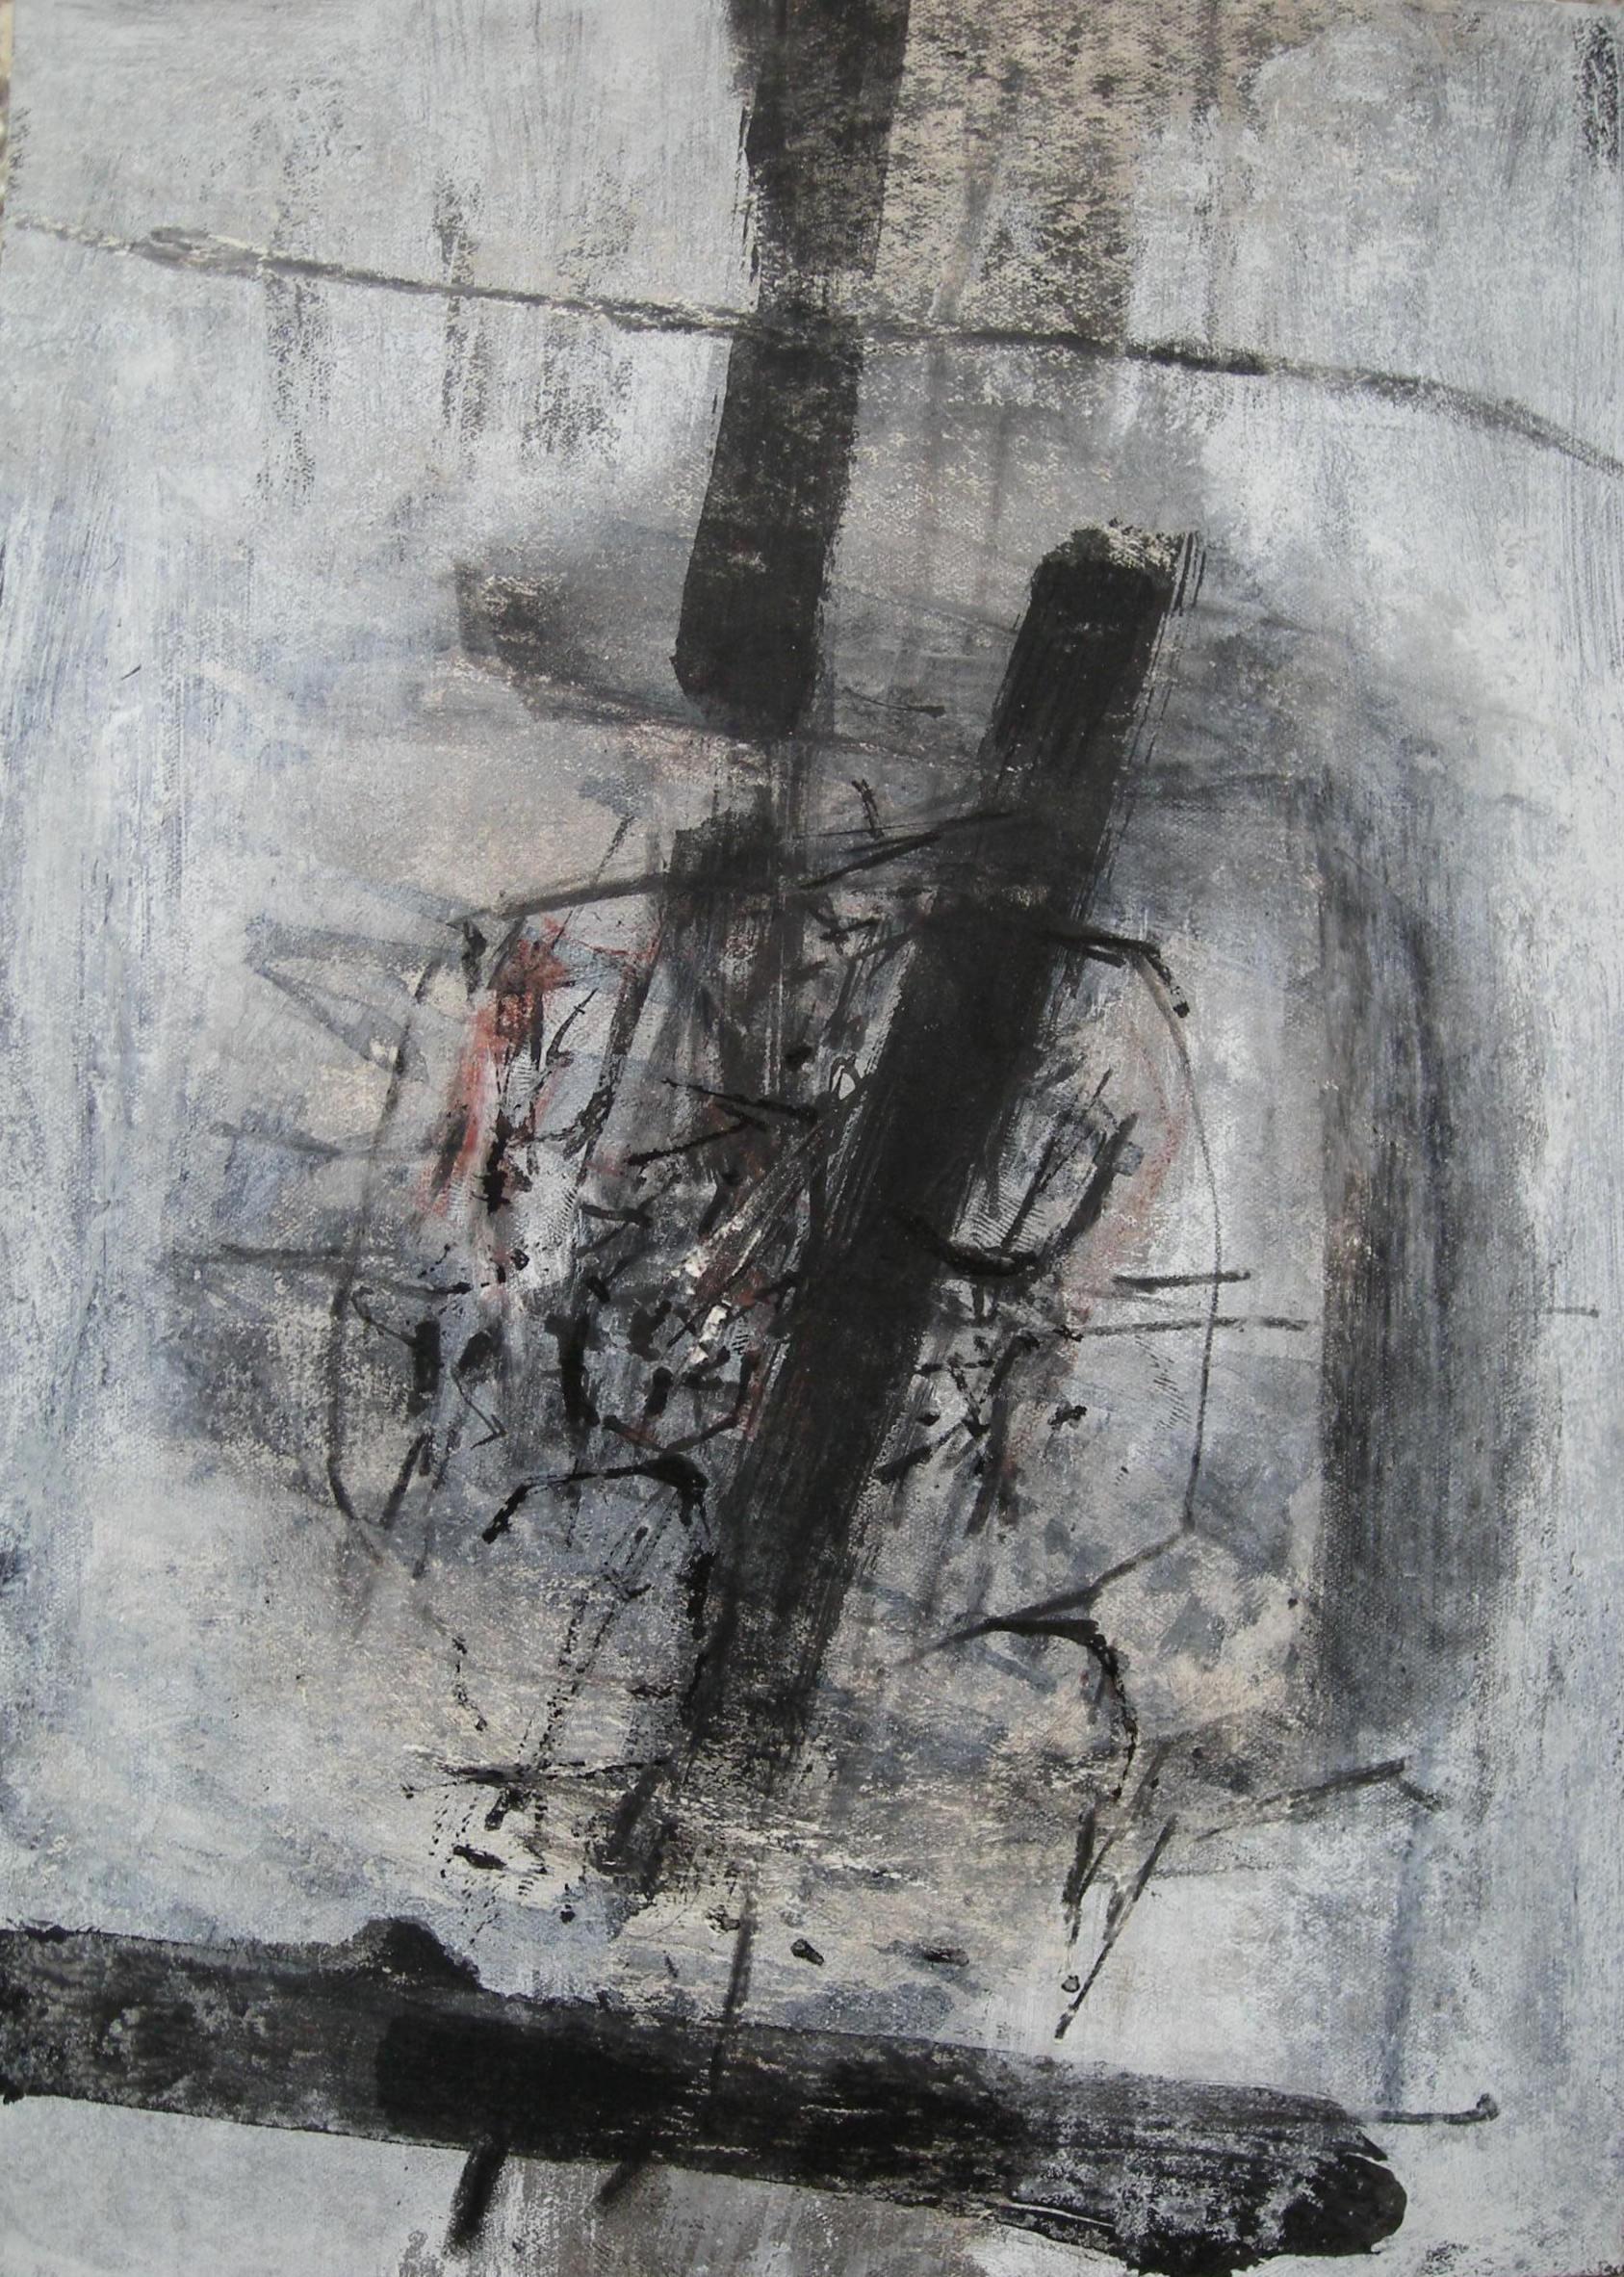 Karl Friedrich Dahmen - abstract